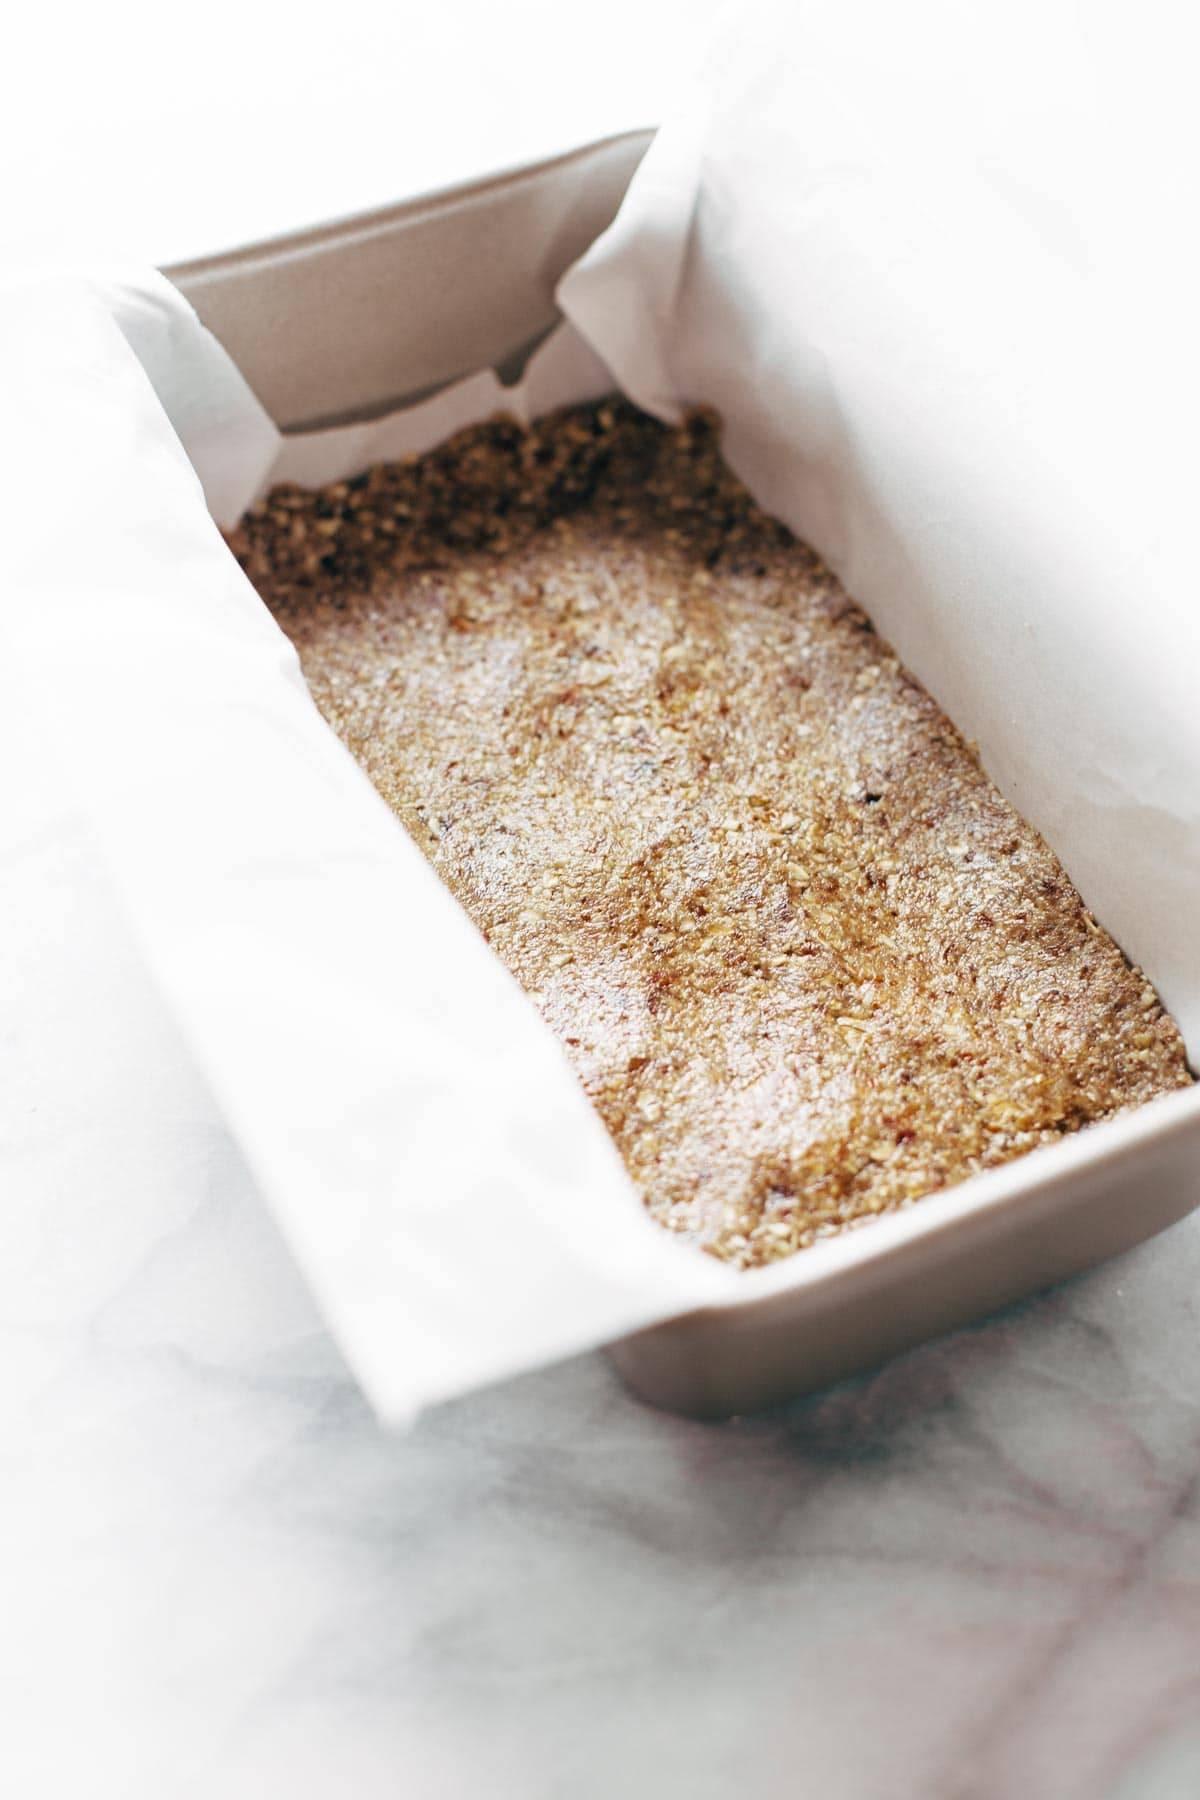 Crust for Raw Salted Chocolate Bars | pinchofyum.com